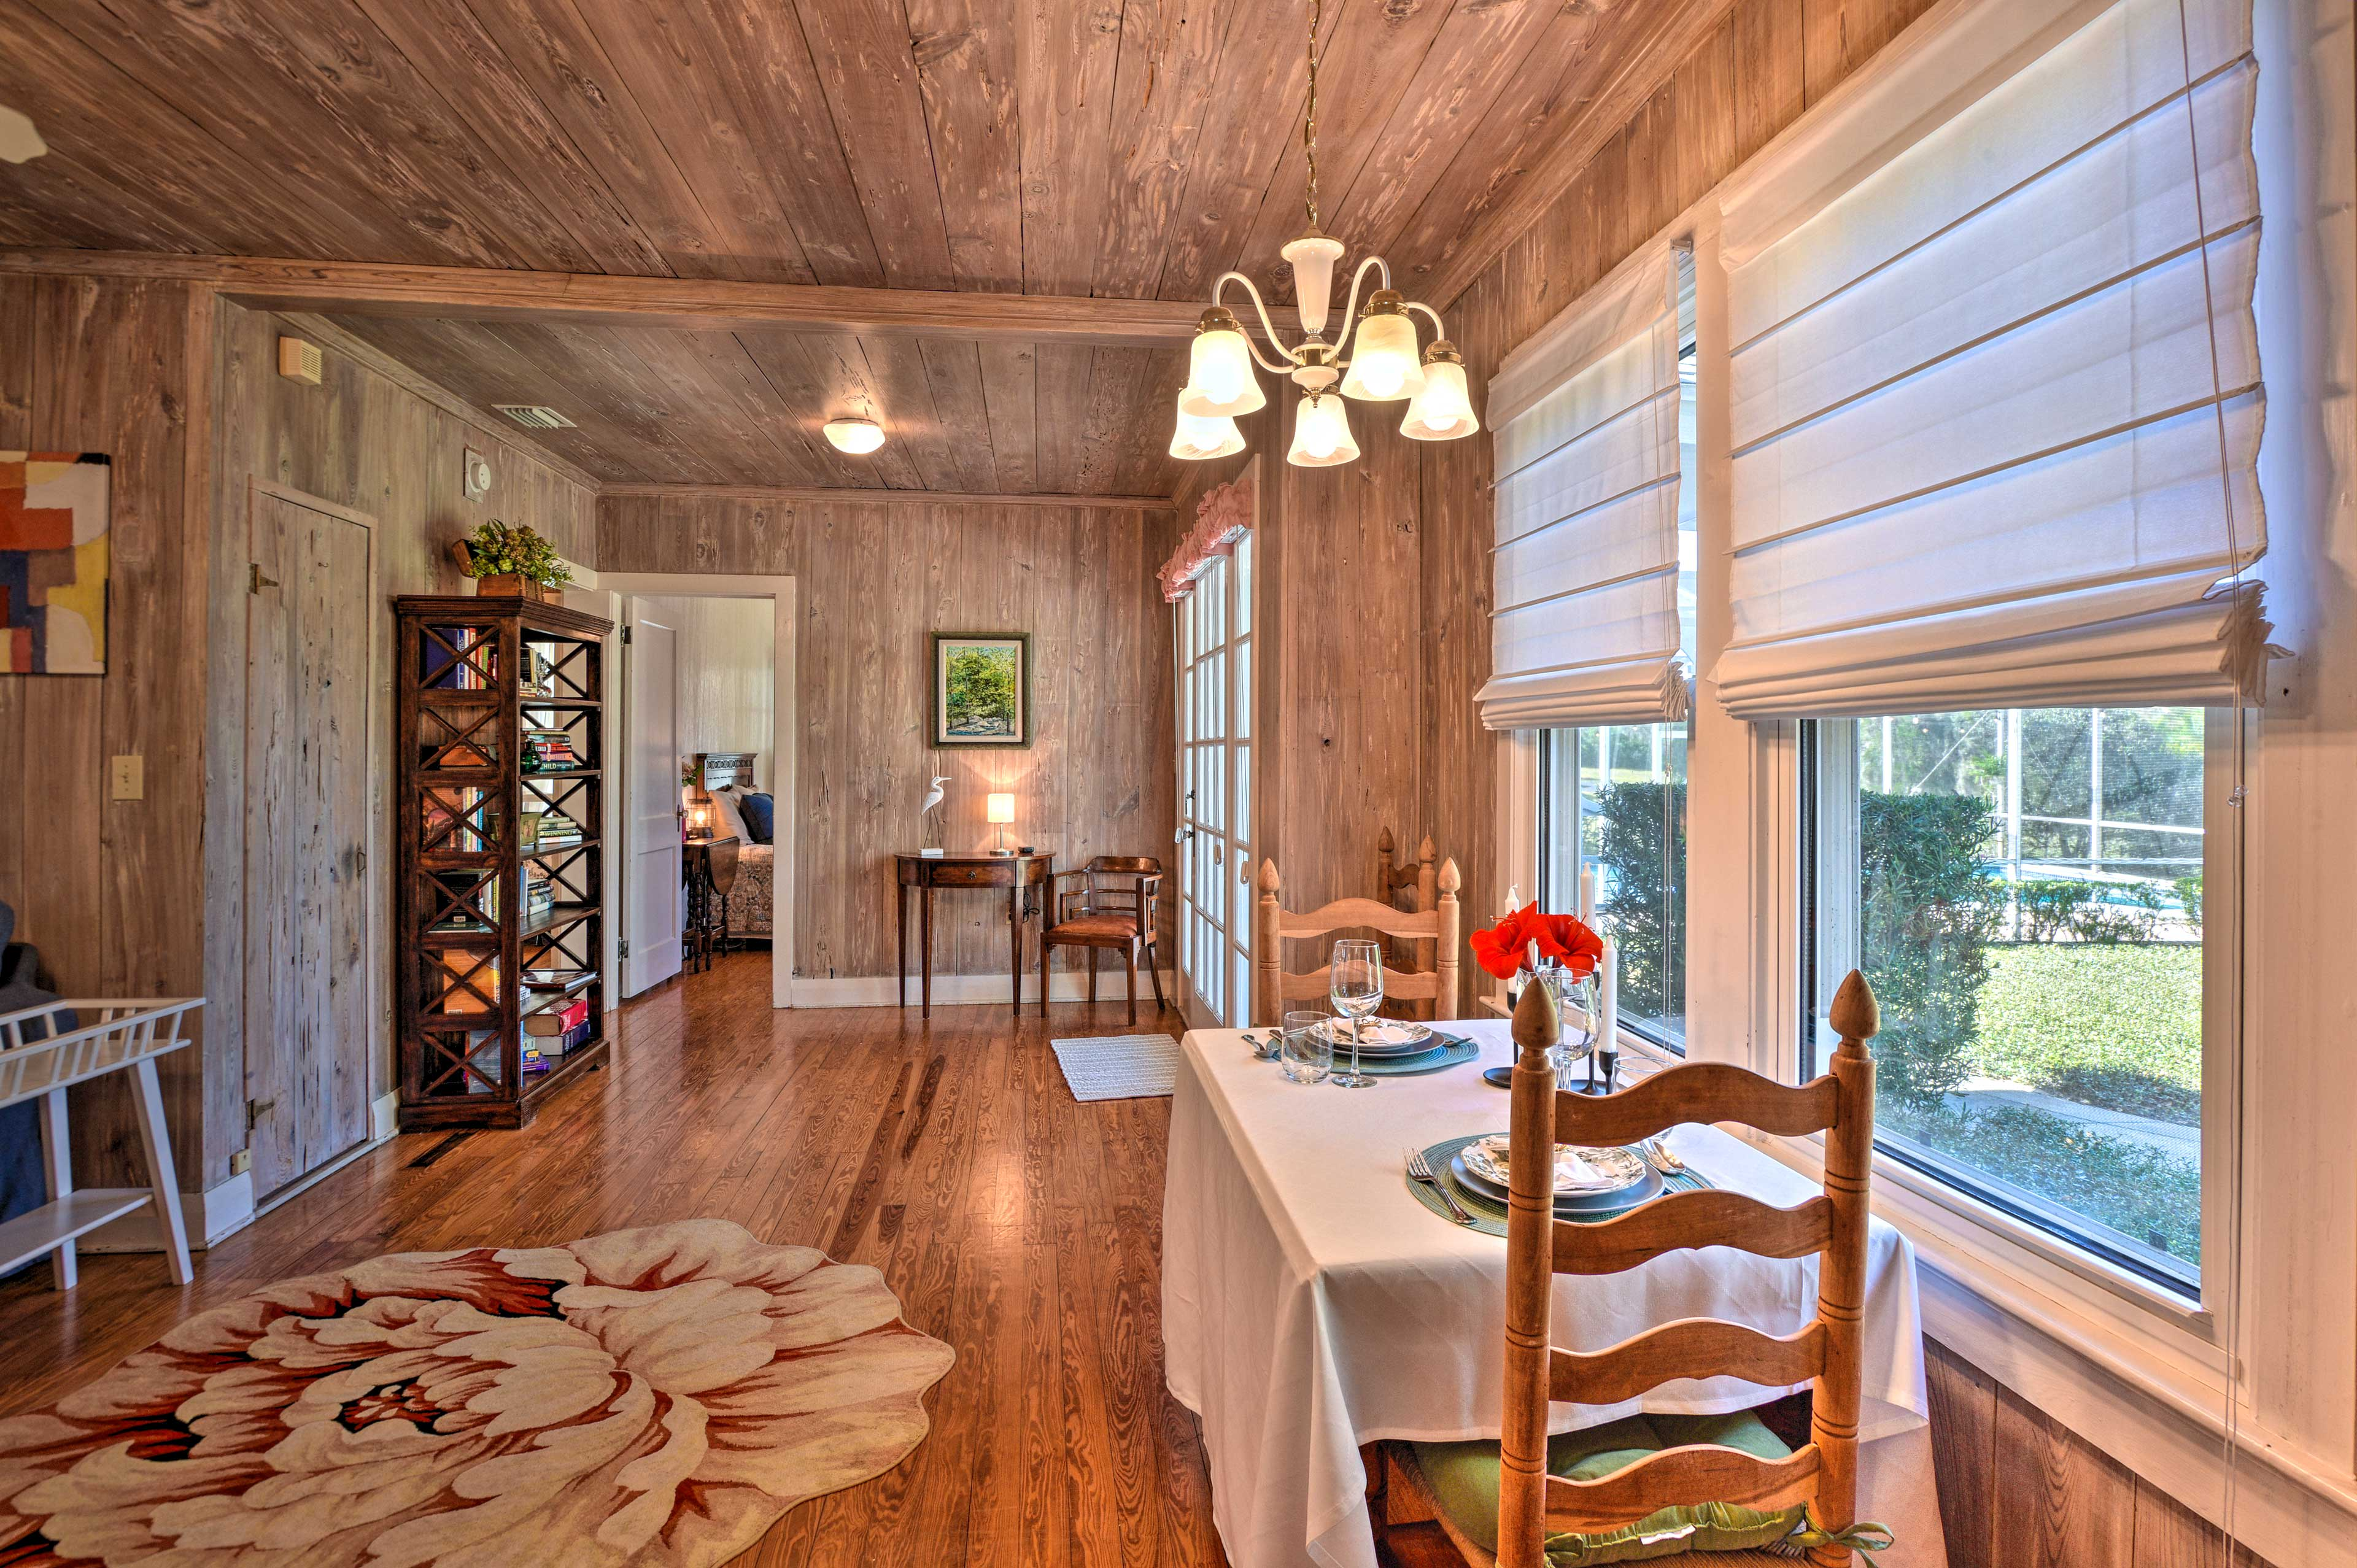 Follow the hardwood floors into the living area.